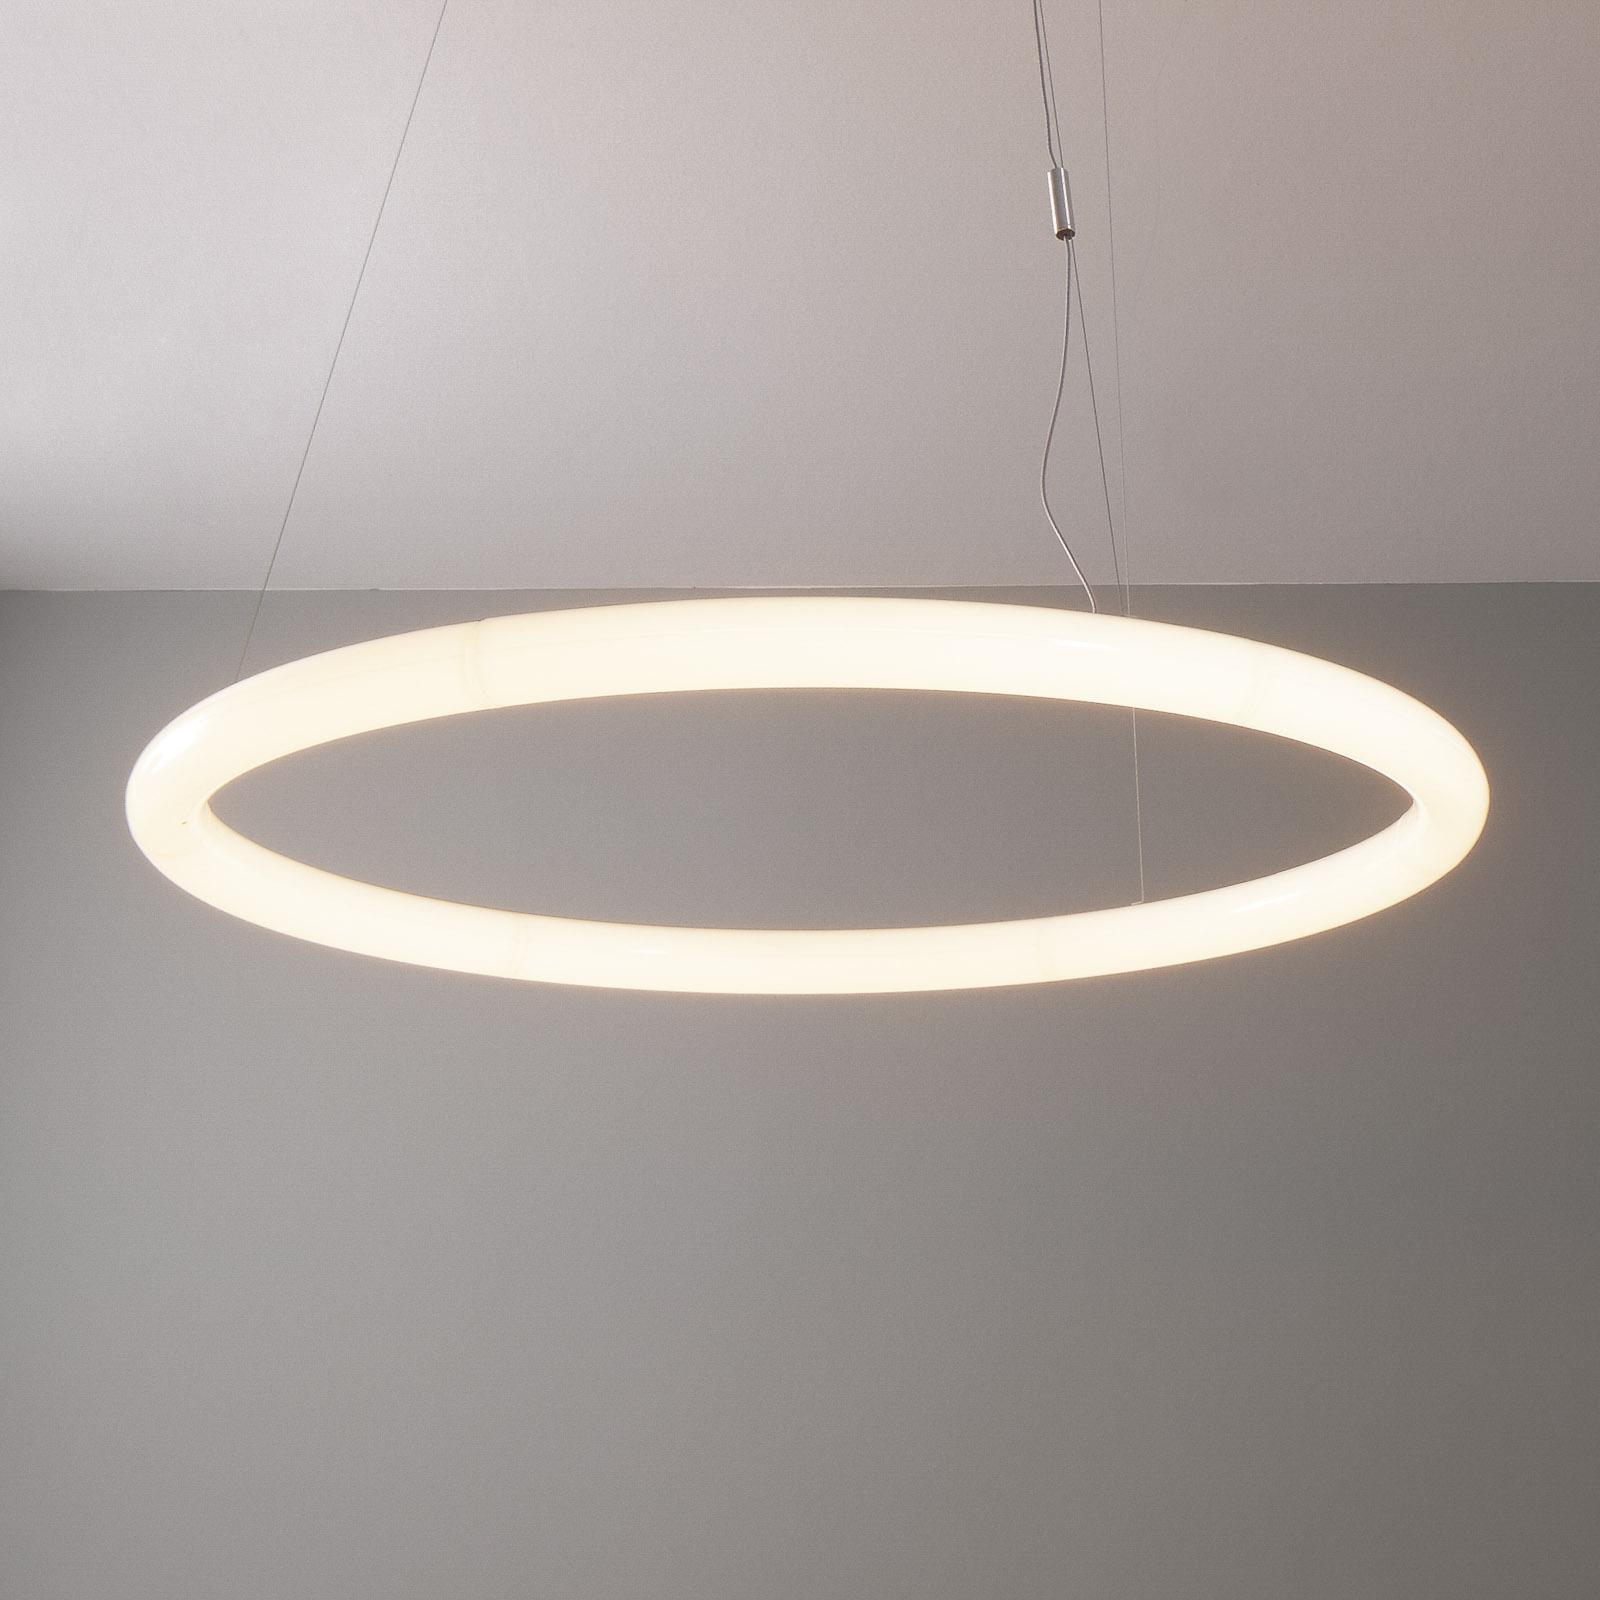 Artemide Alphabet of light circular via app 90 cm